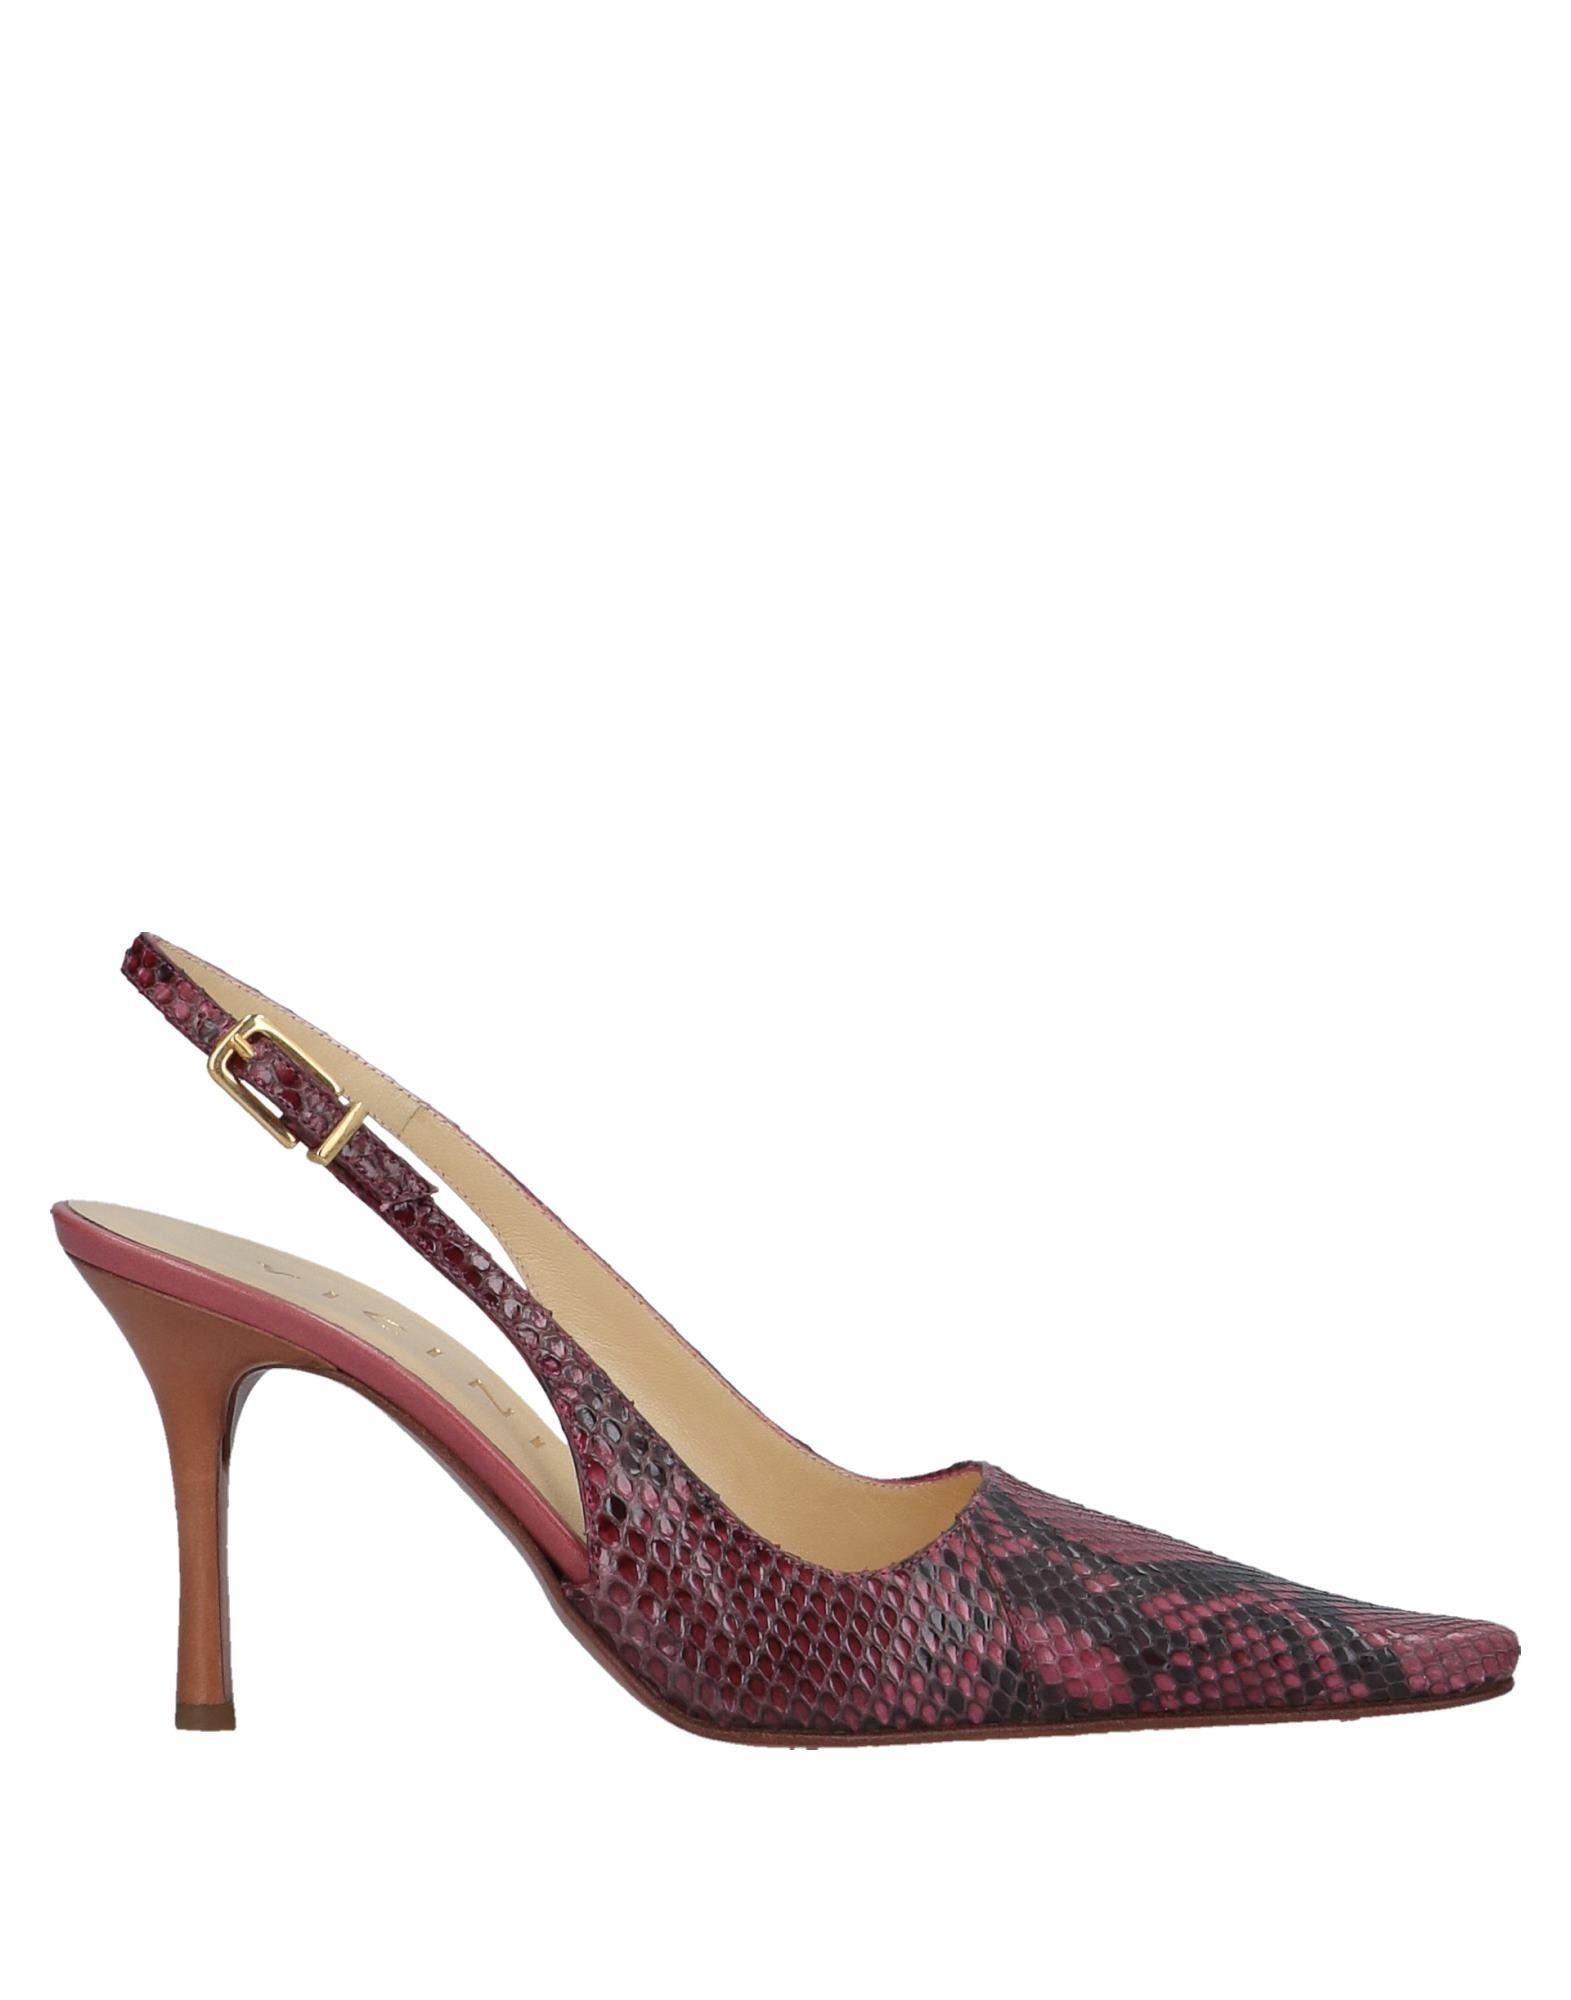 Stilvolle billige Schuhe Vicini Pumps 11522065BT Damen  11522065BT Pumps 276690